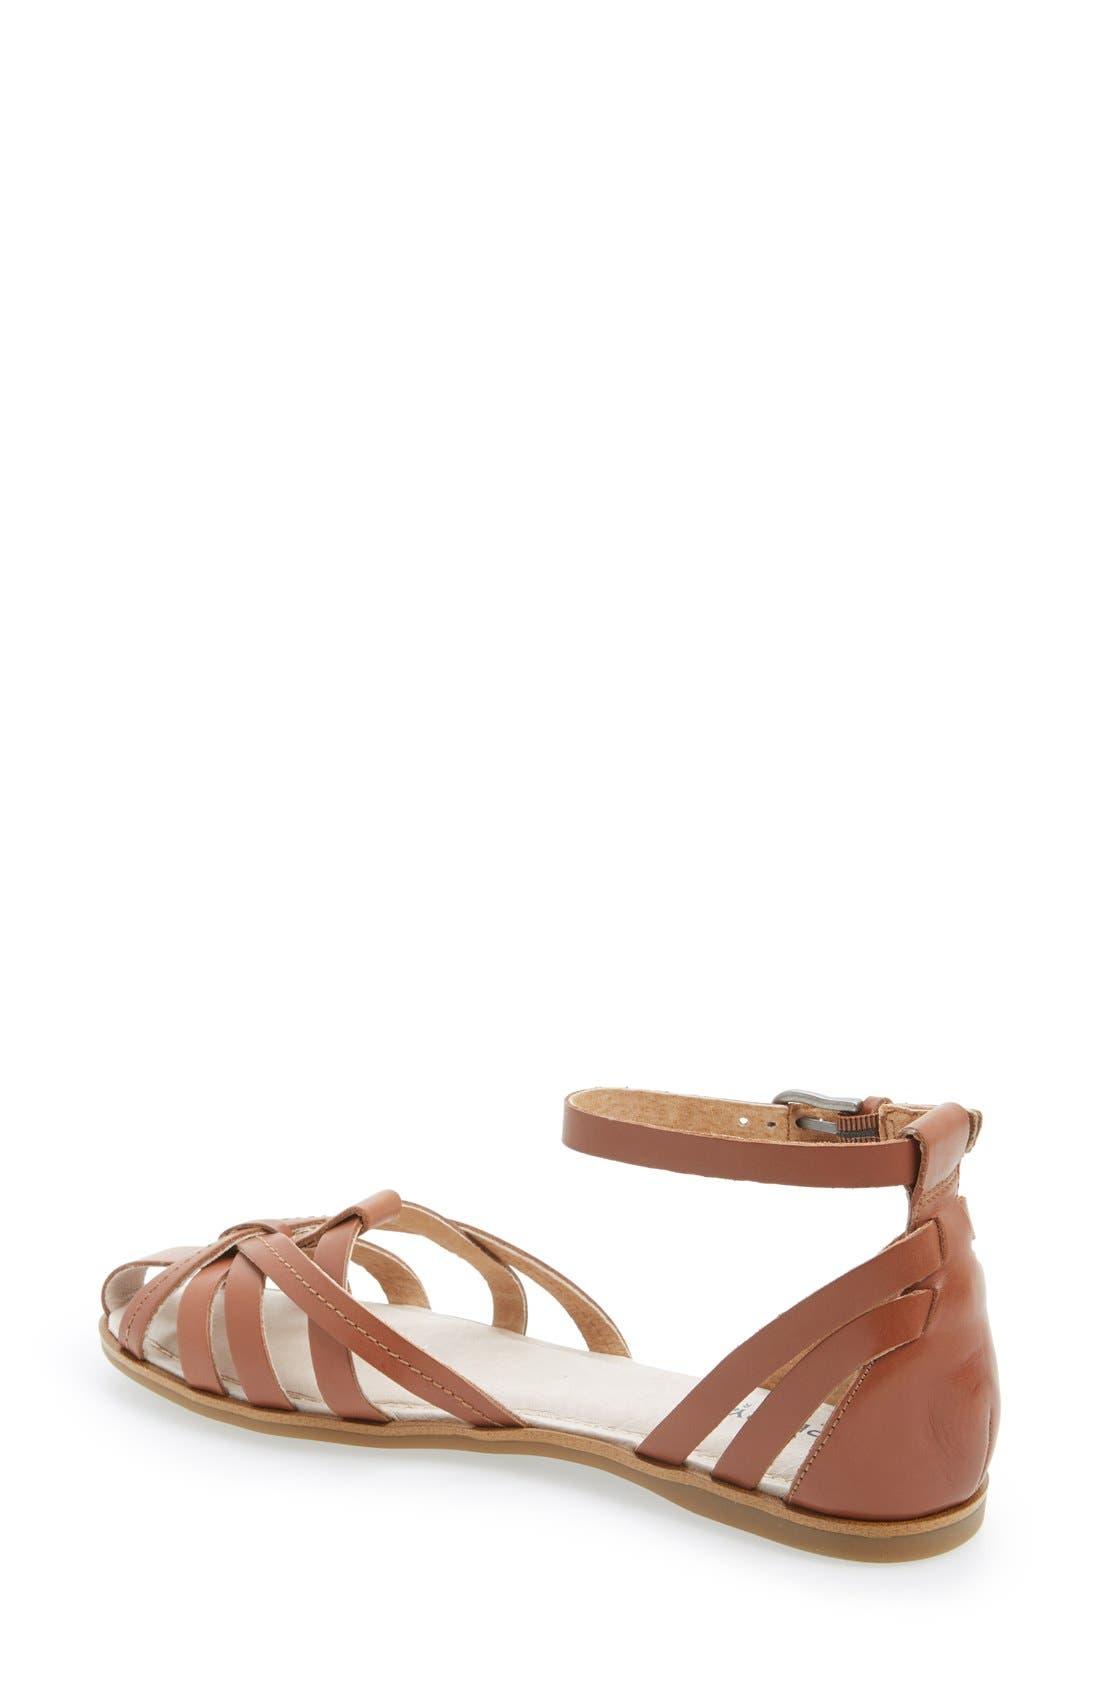 Alternate Image 2  - Sperry 'June' Leather Ankle Strap Sandal (Women)